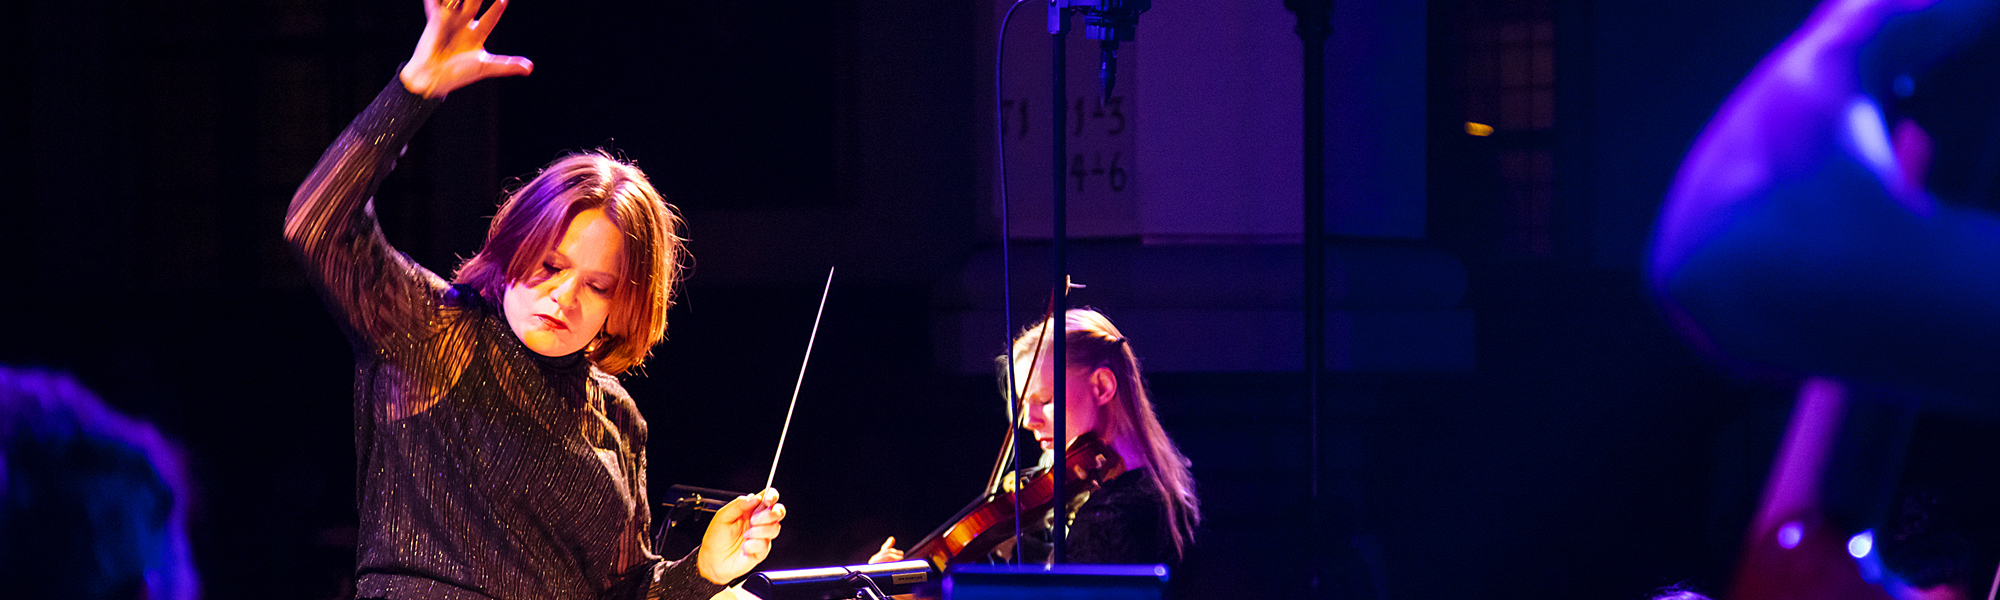 Conductor - Anne Marie Granau Julekoncert 2019. Foto: Jeanette Philipsen